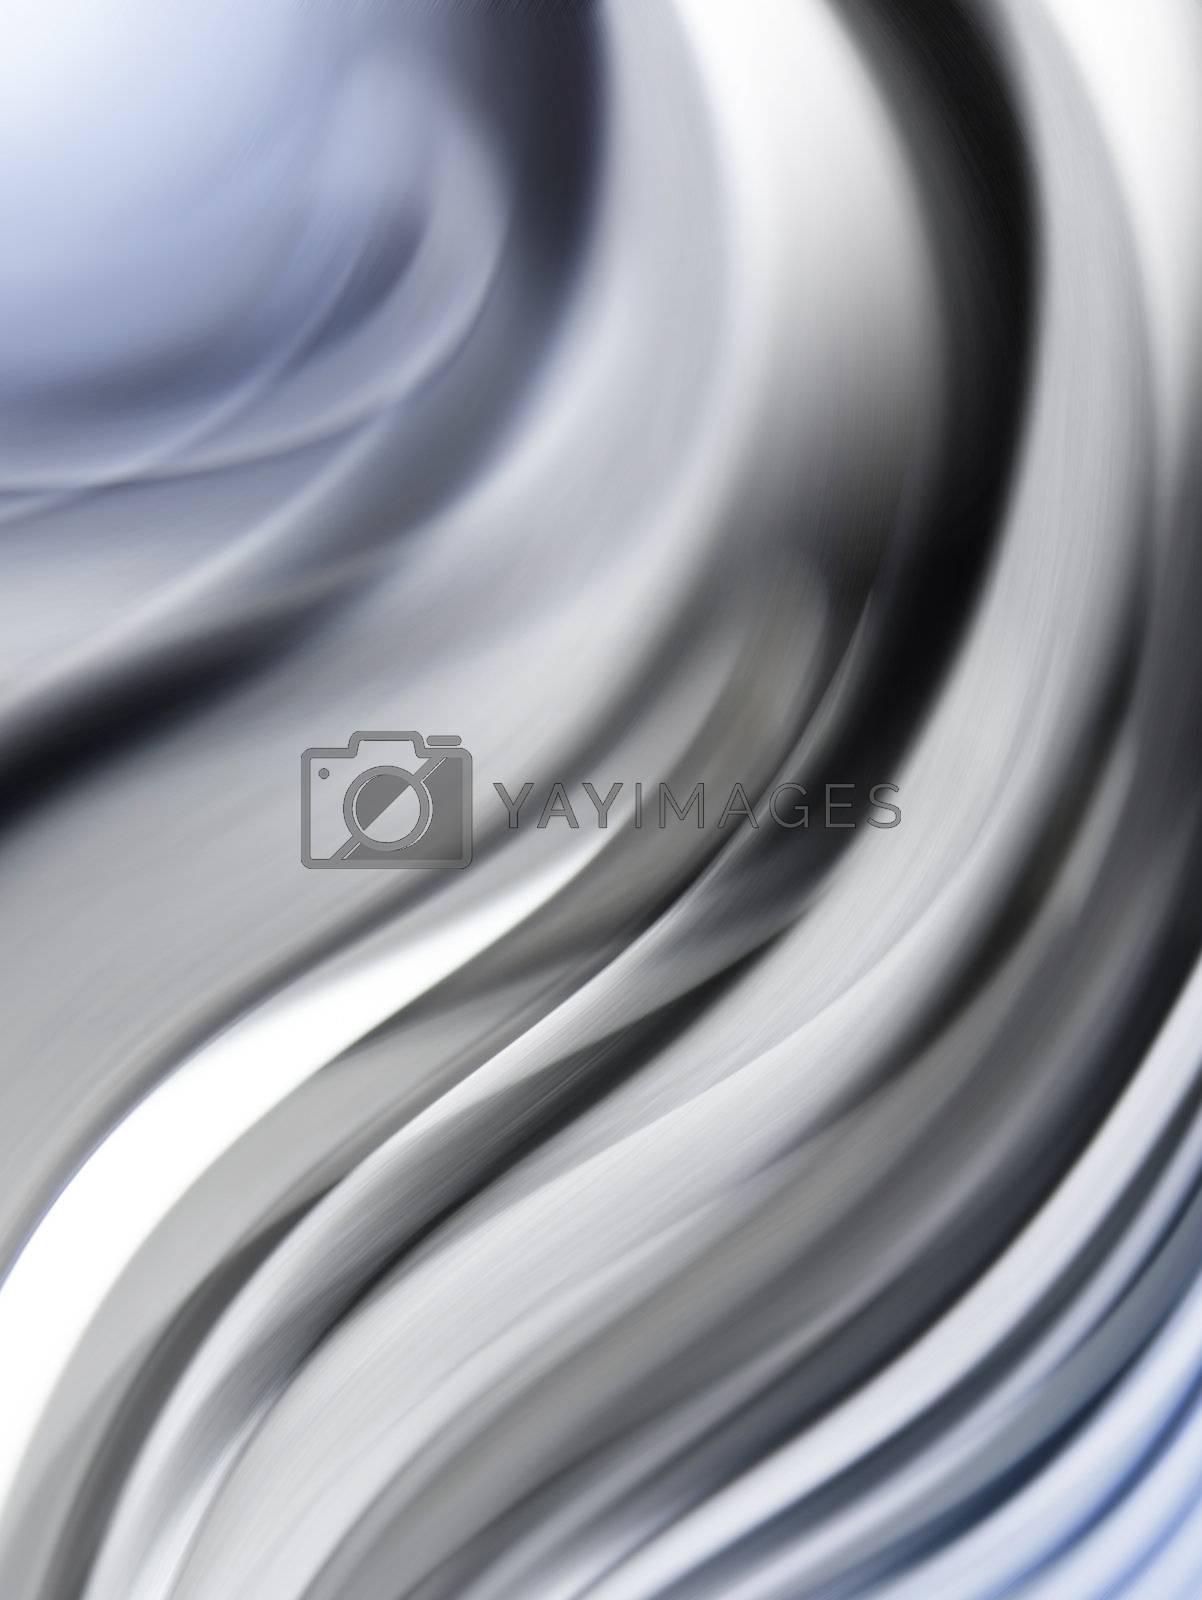 wavy abstract bakground like shining soft metal texture